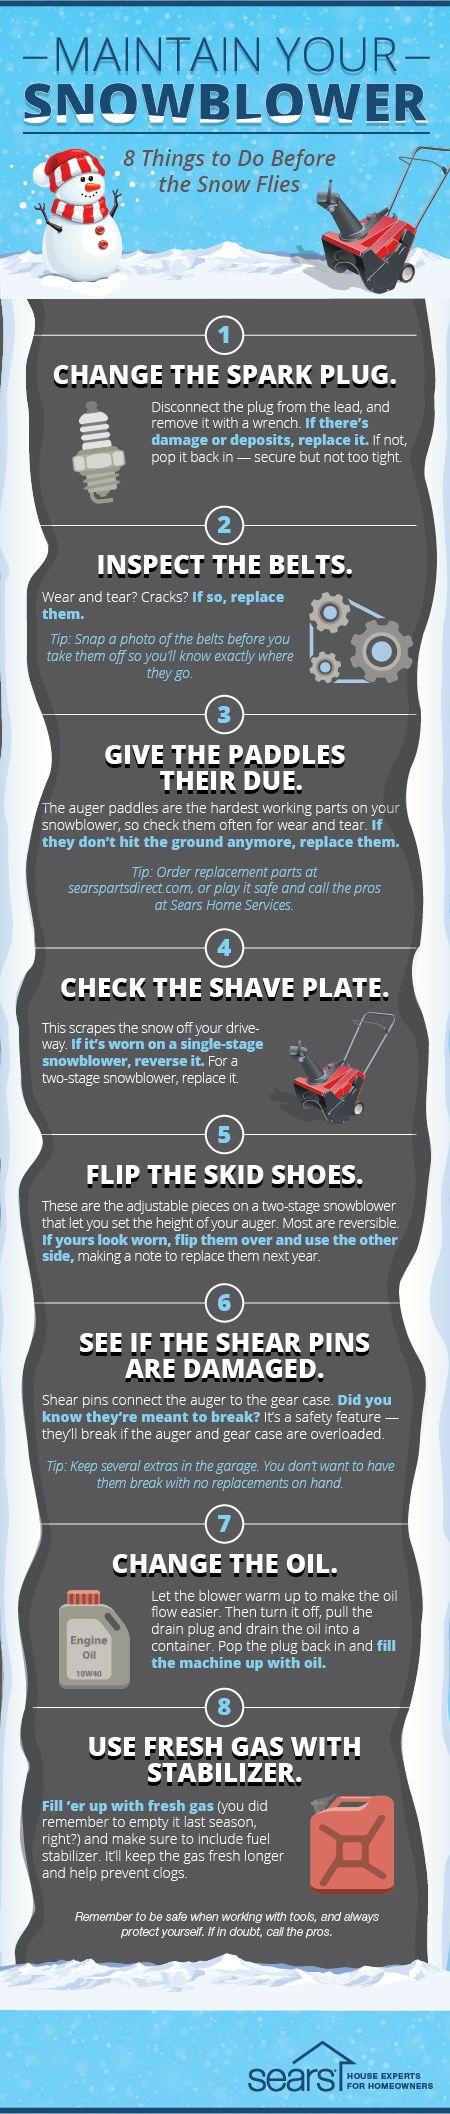 snowblower maintenance tips